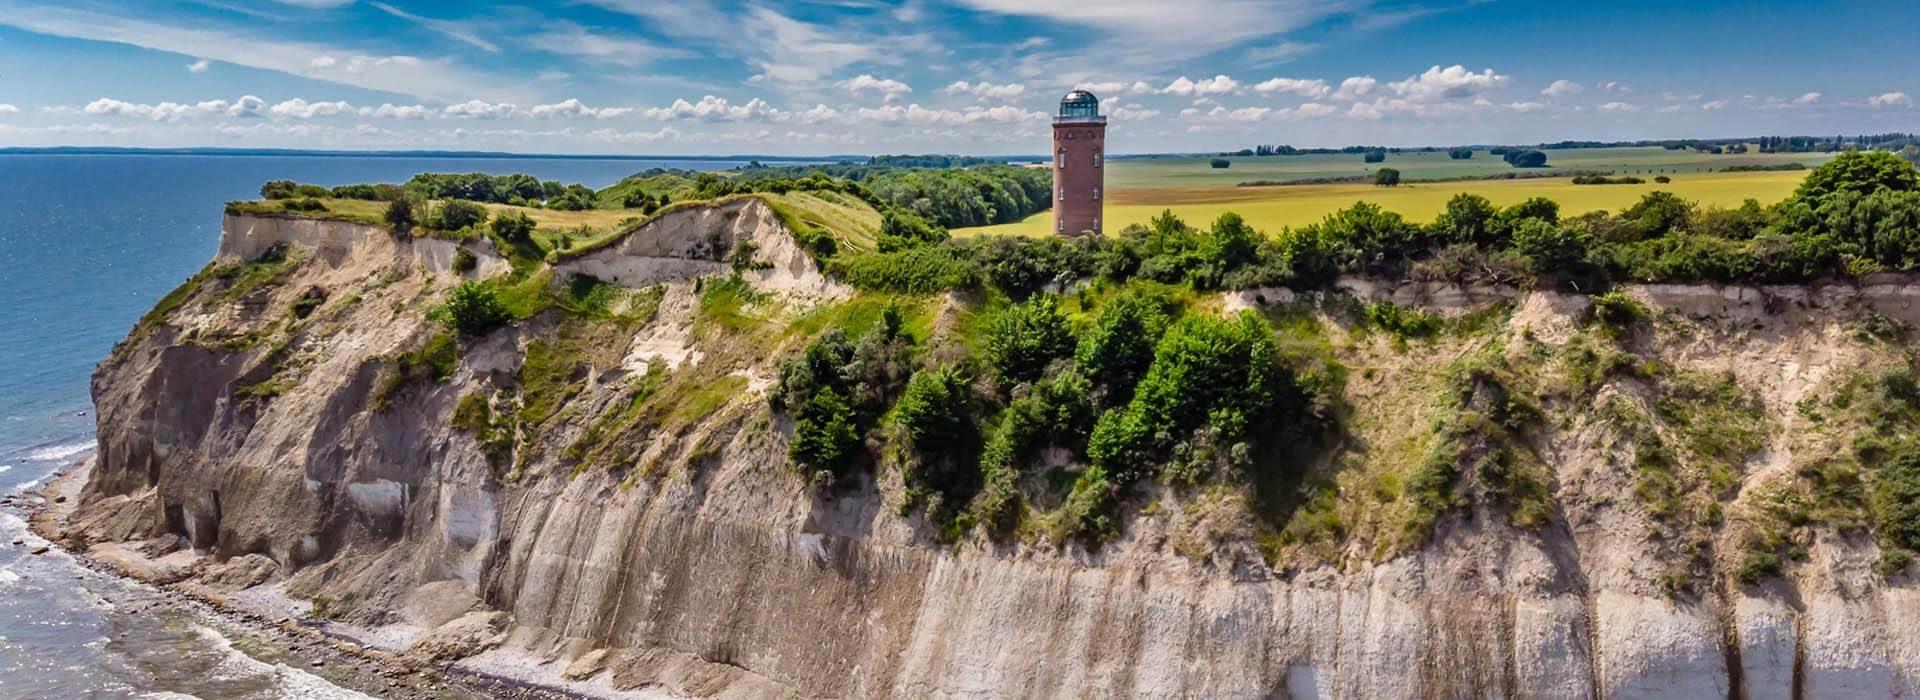 <small>deutschlands größte Insel</small>Rügen